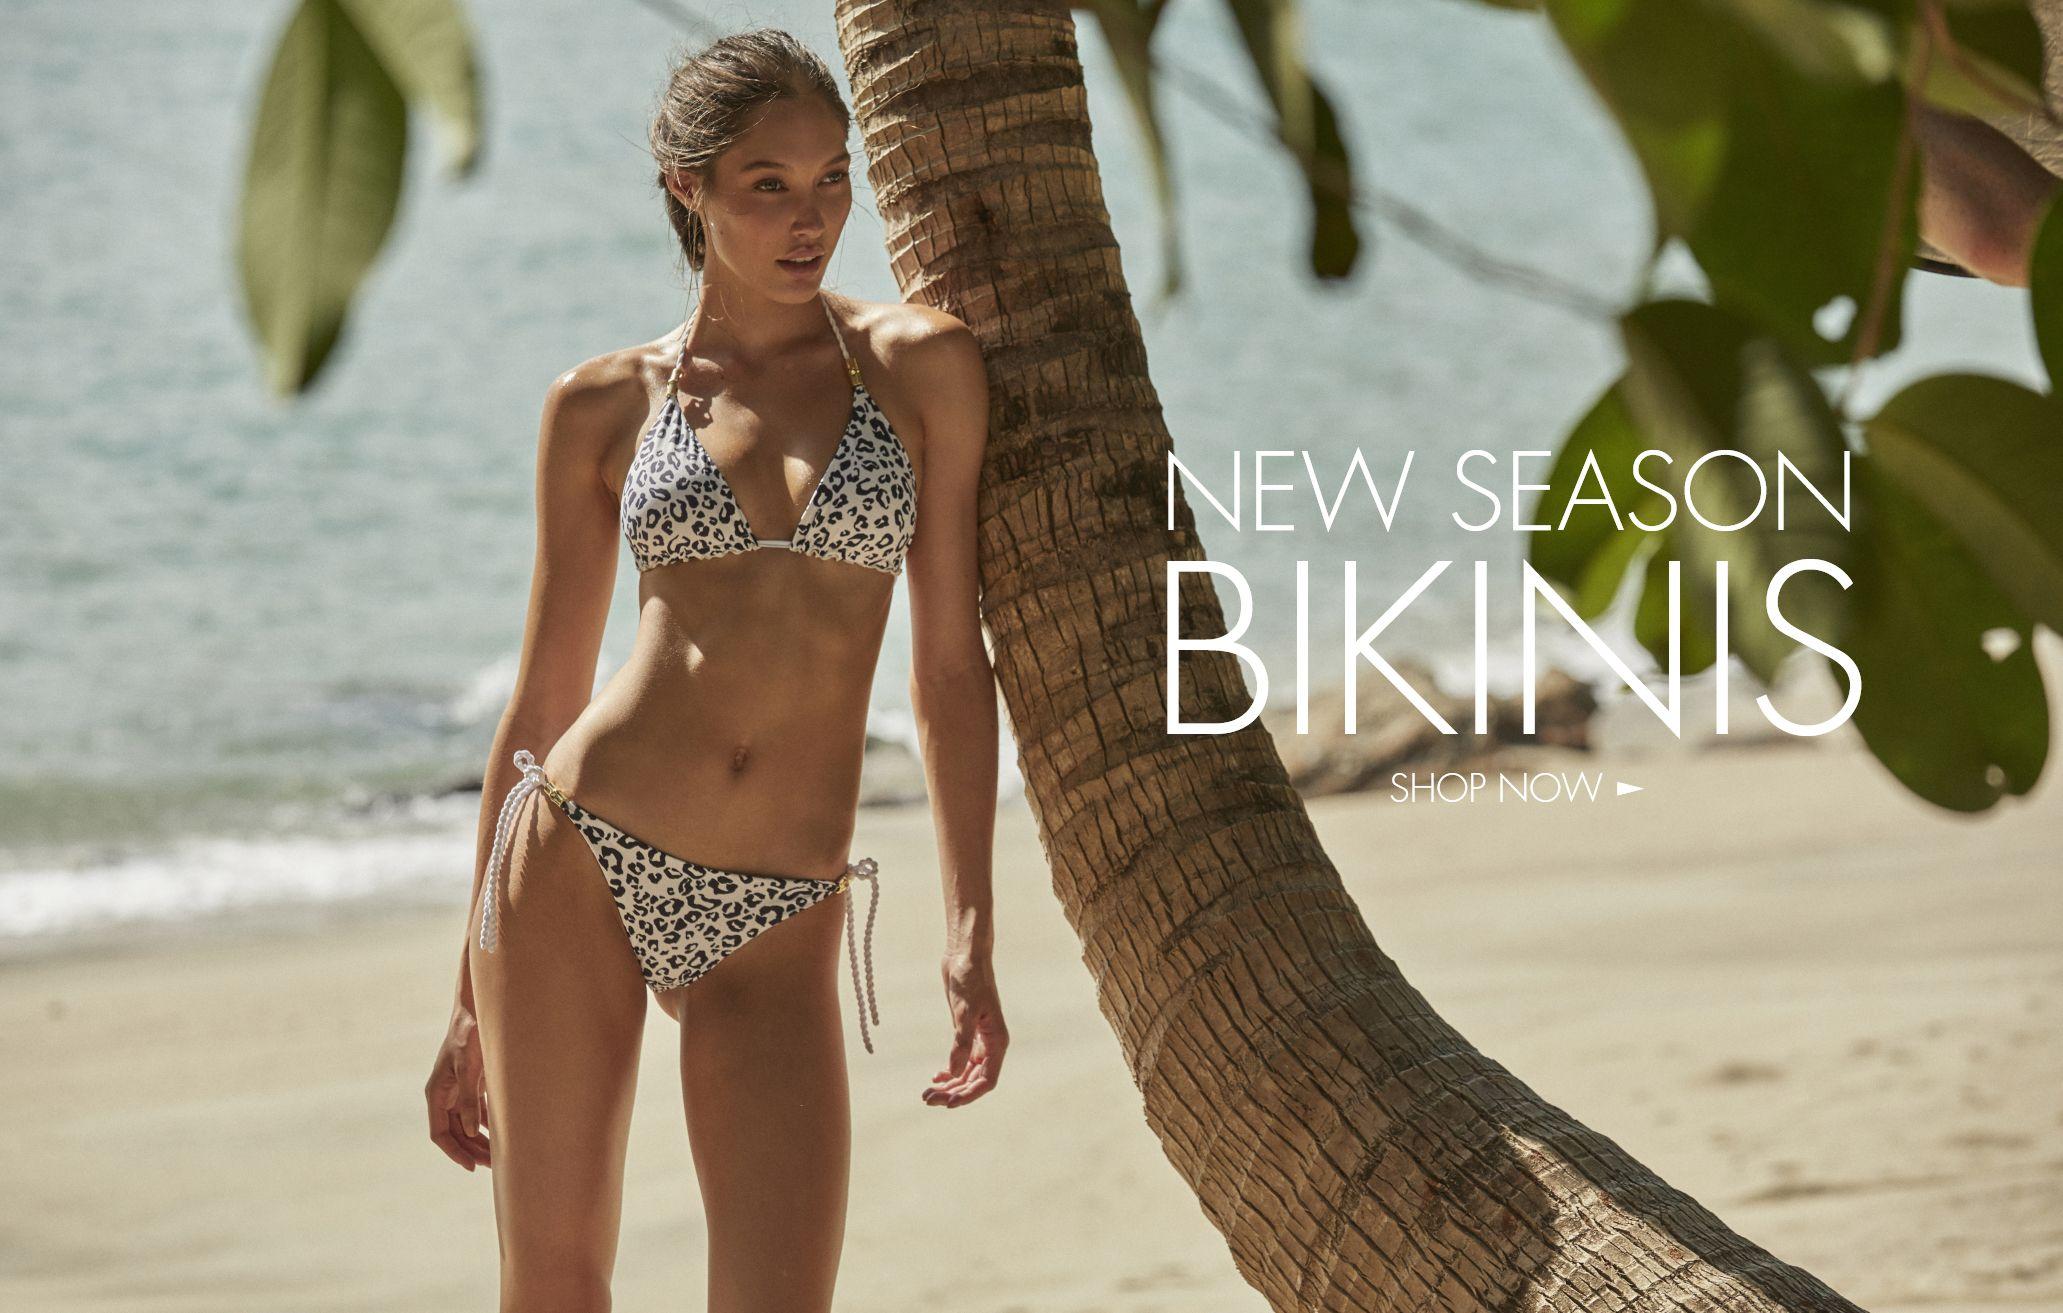 New Season Bikinis 2020